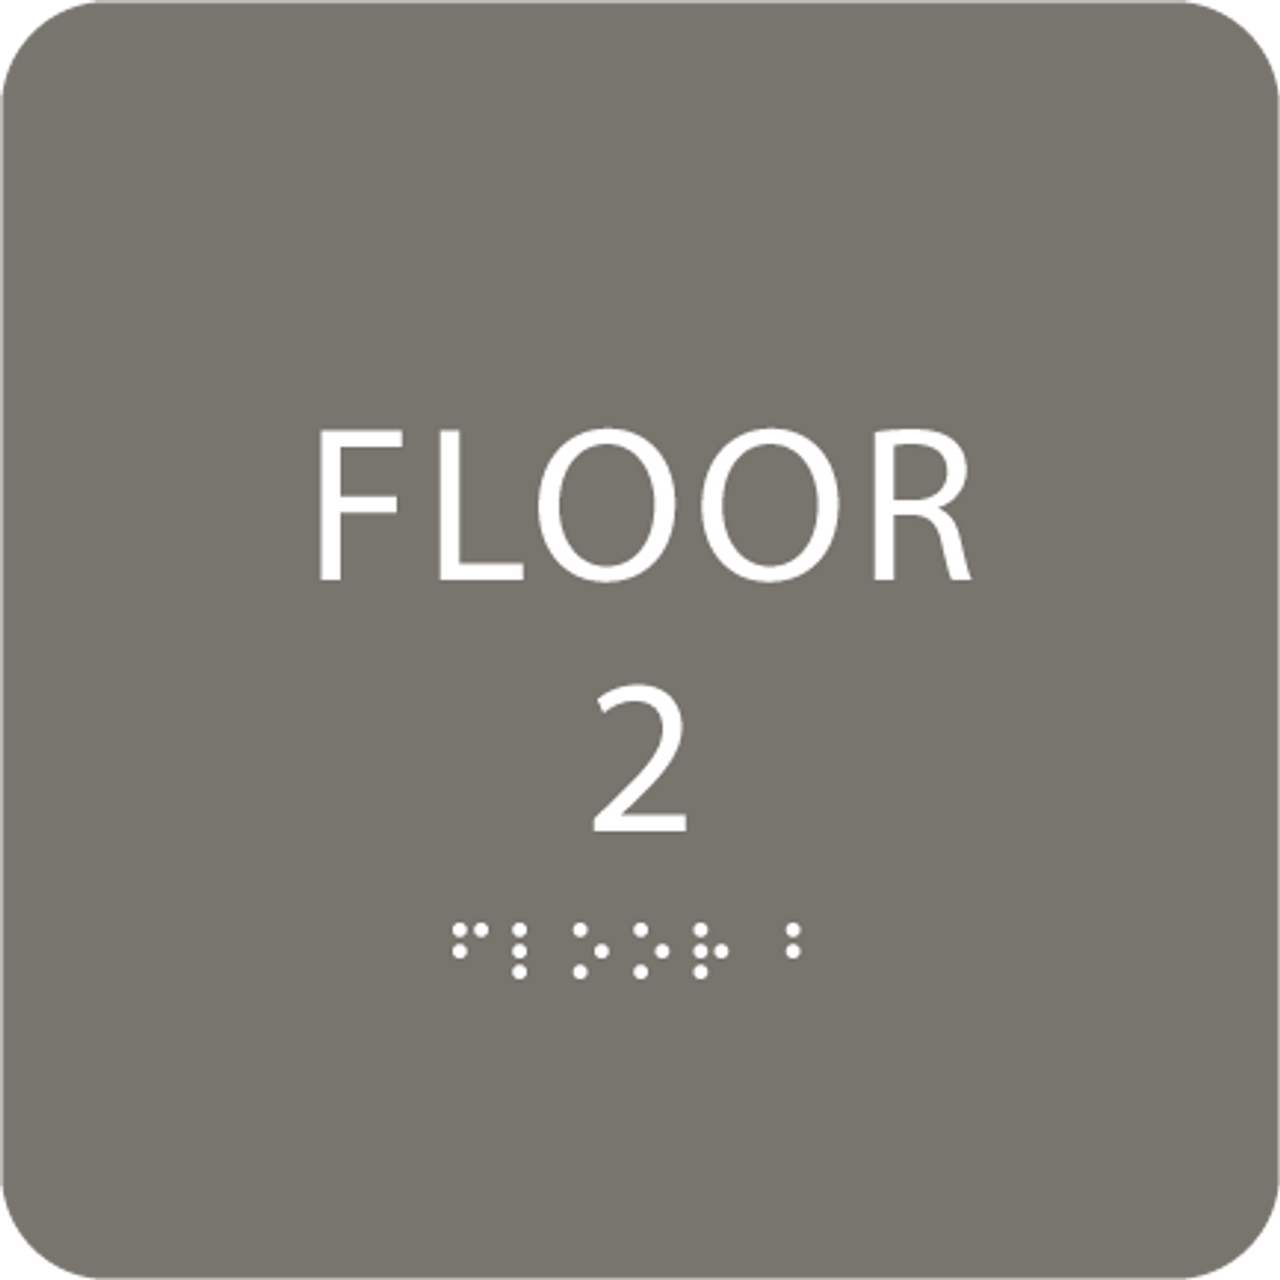 Dark Grey Floor 2 Identification Sign